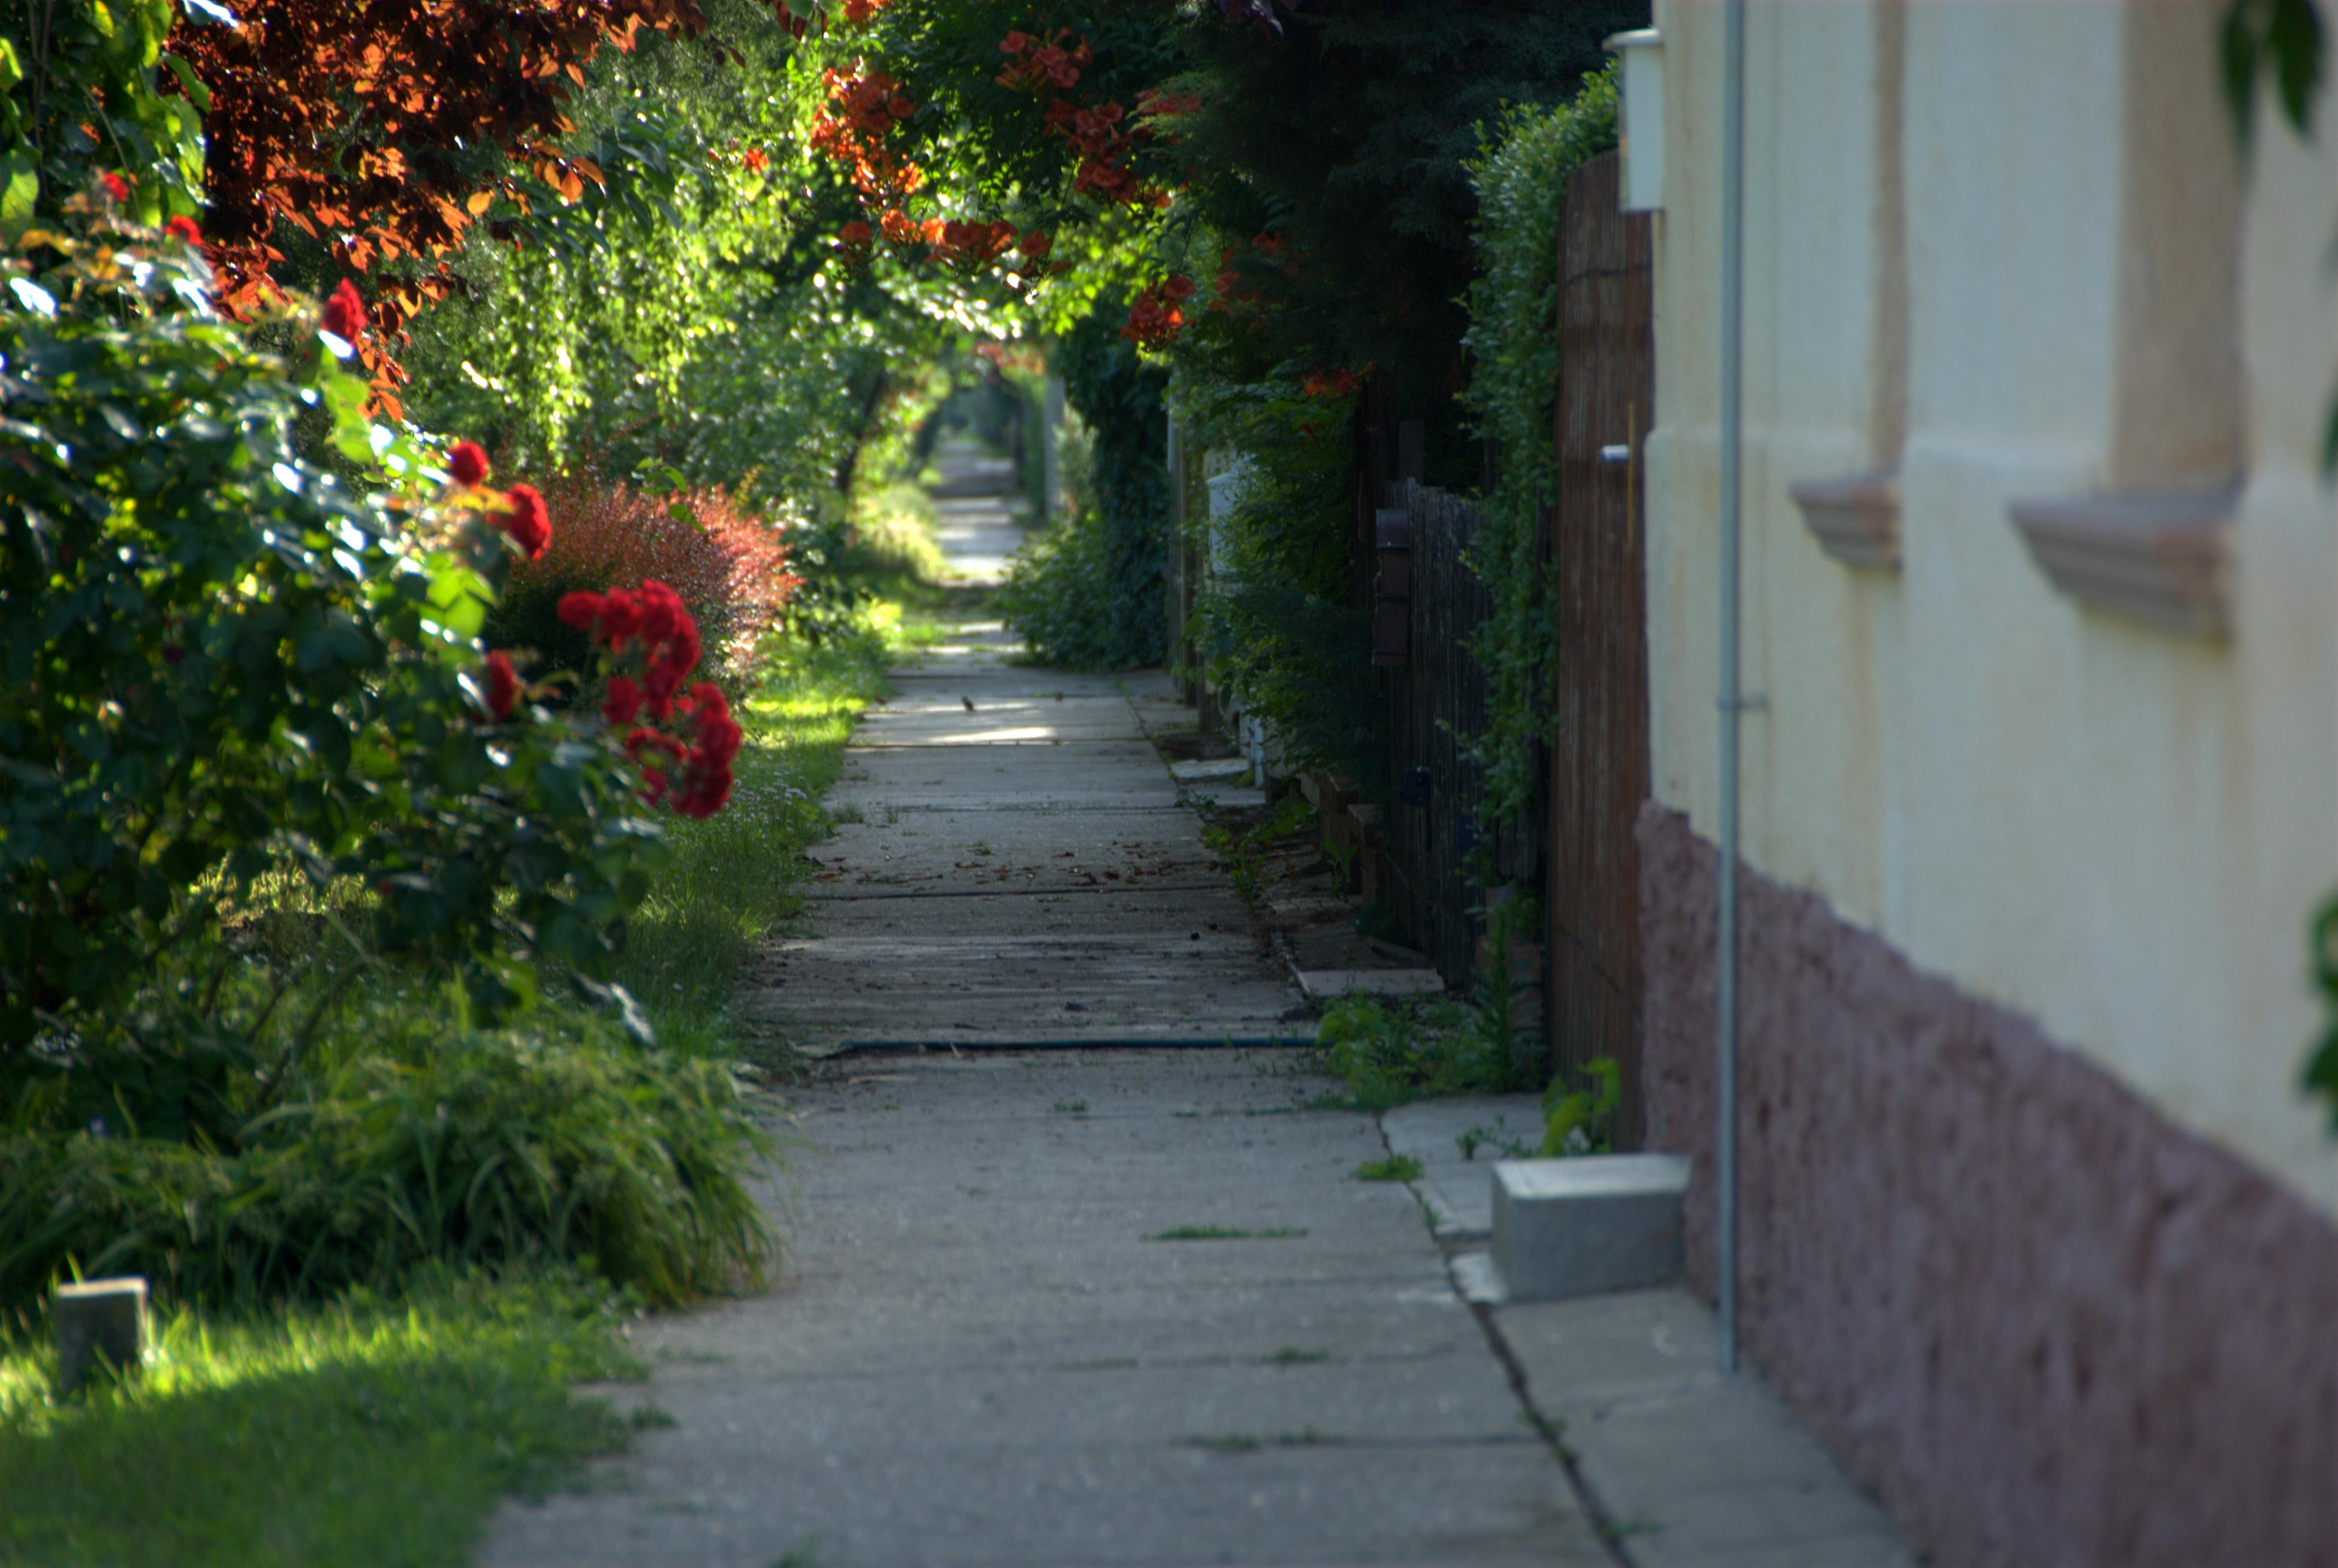 Attractive Leaf Walkway Garden Plant Path Public Space Alley Tree Flower Wall House  Road Grass Street Shrub